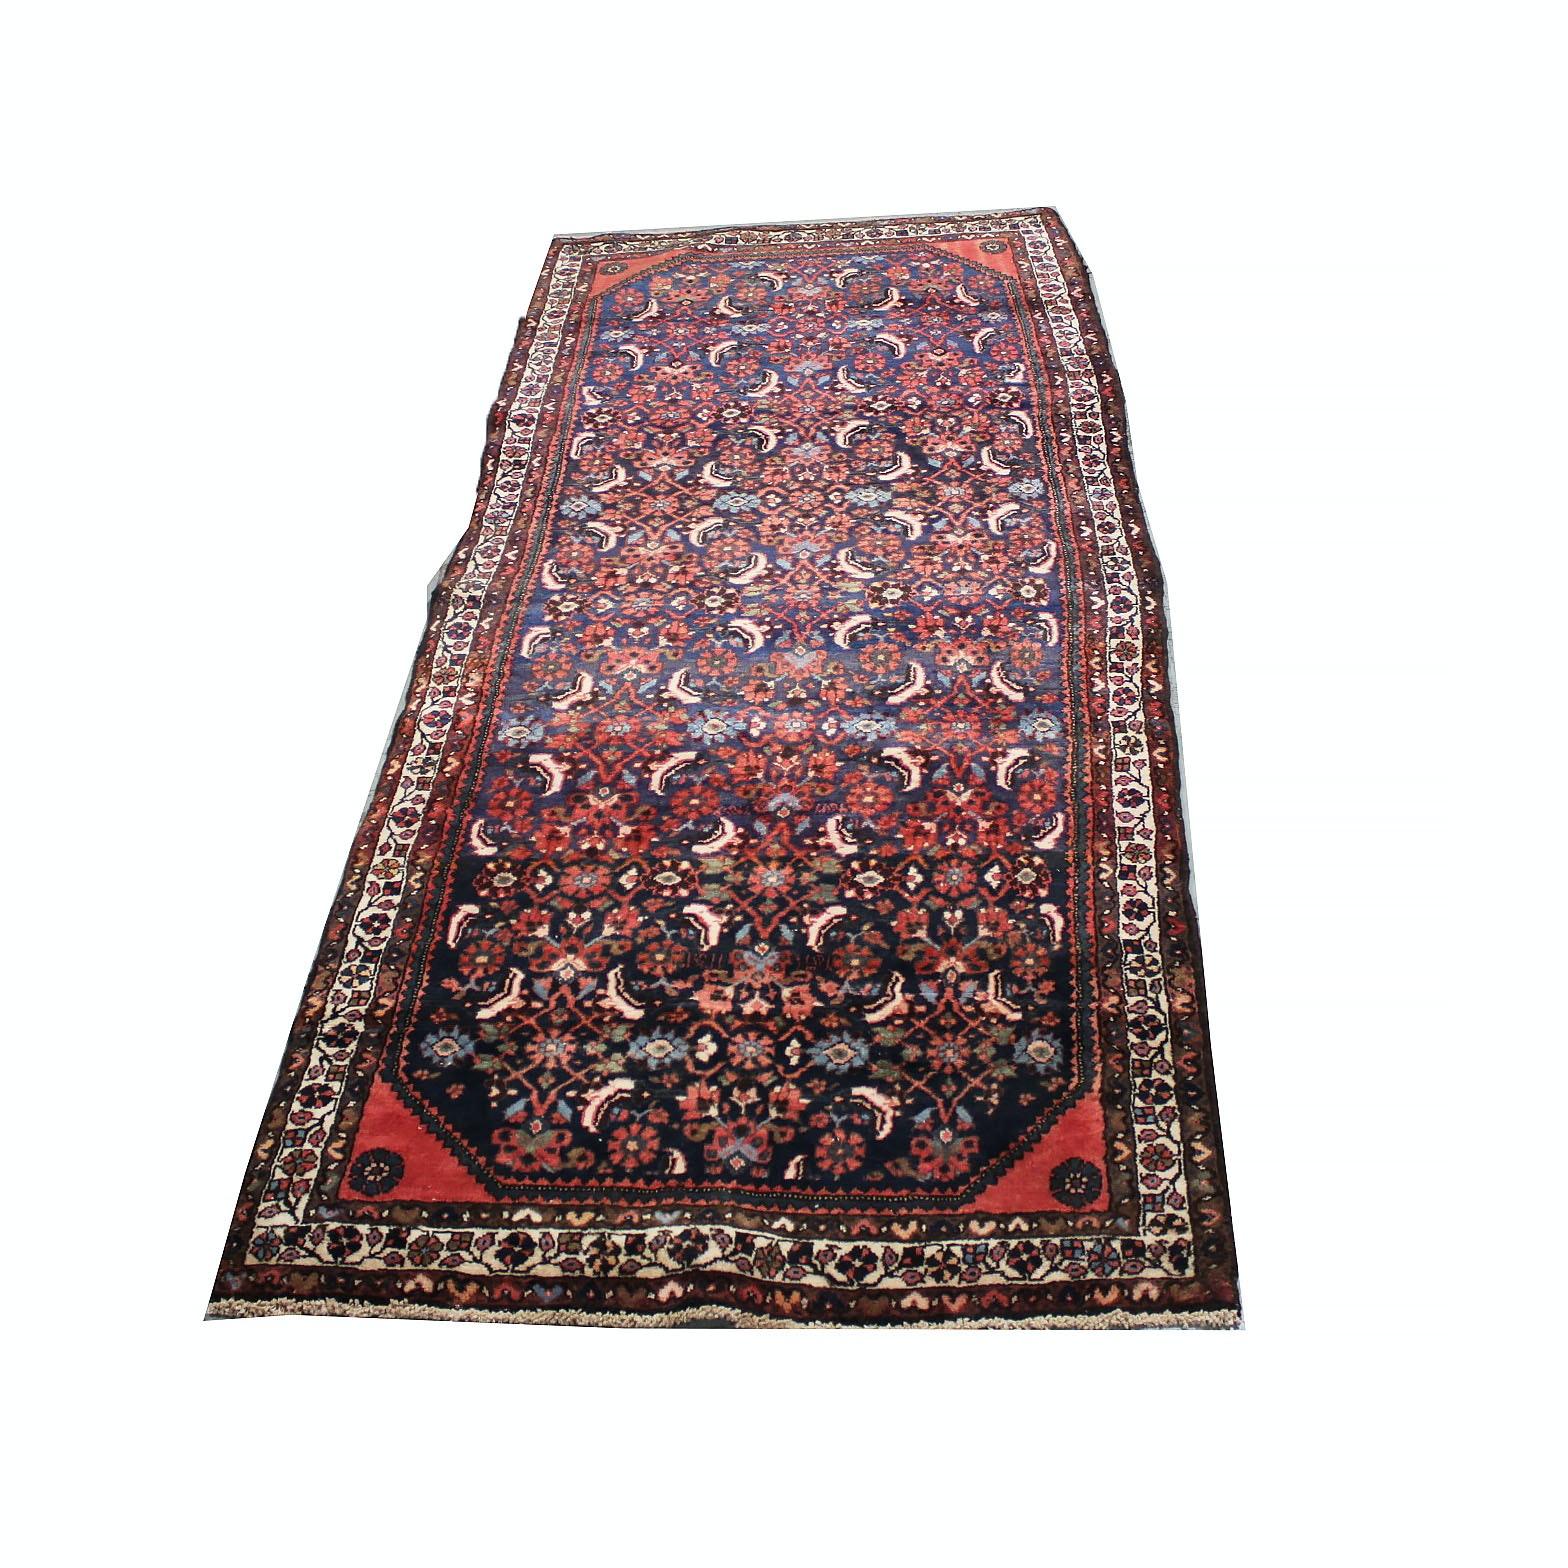 Vintage Hand-Knotted Persian Lilihan Wool Long Rug